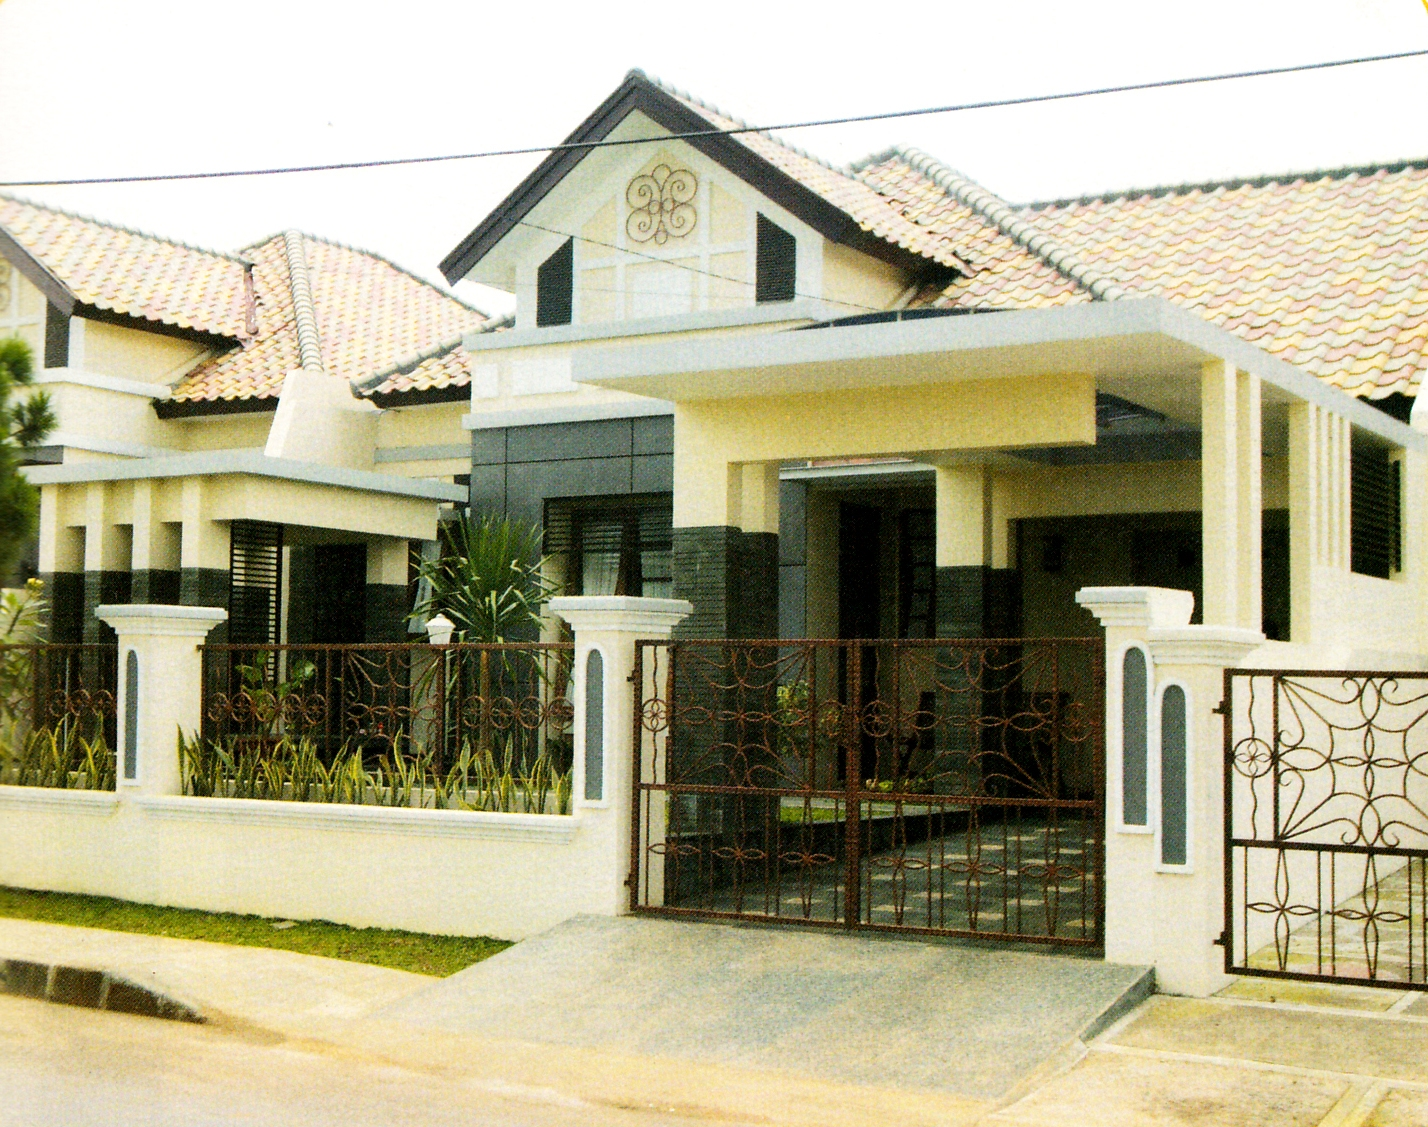 Carport minimalis kombinasi beton polycarbonat rumah idaman kita